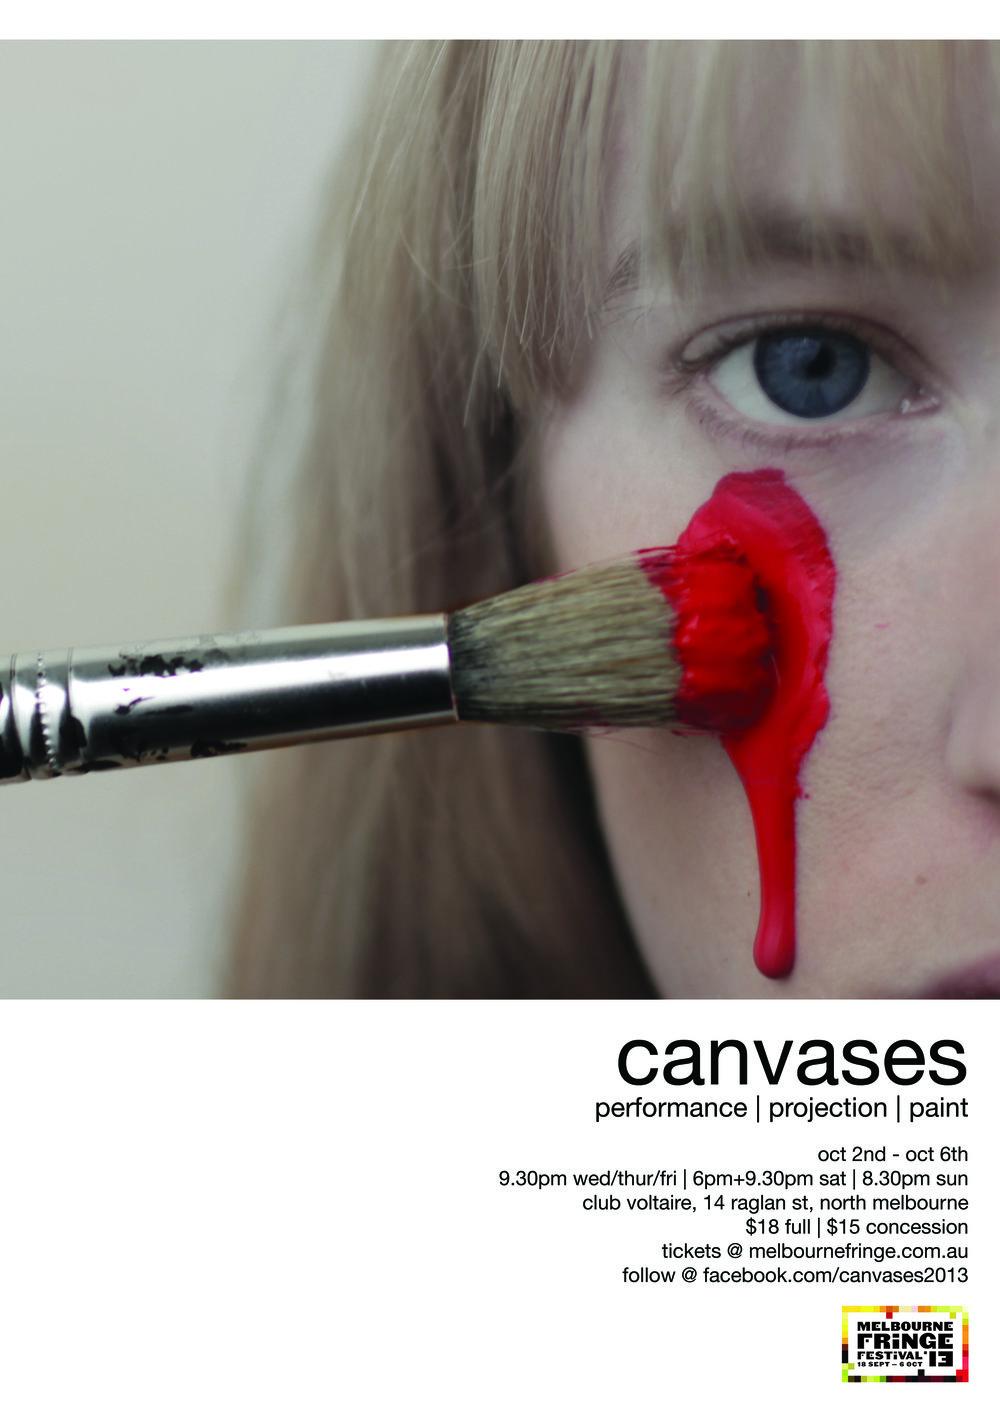 canvasespromoa4.jpg